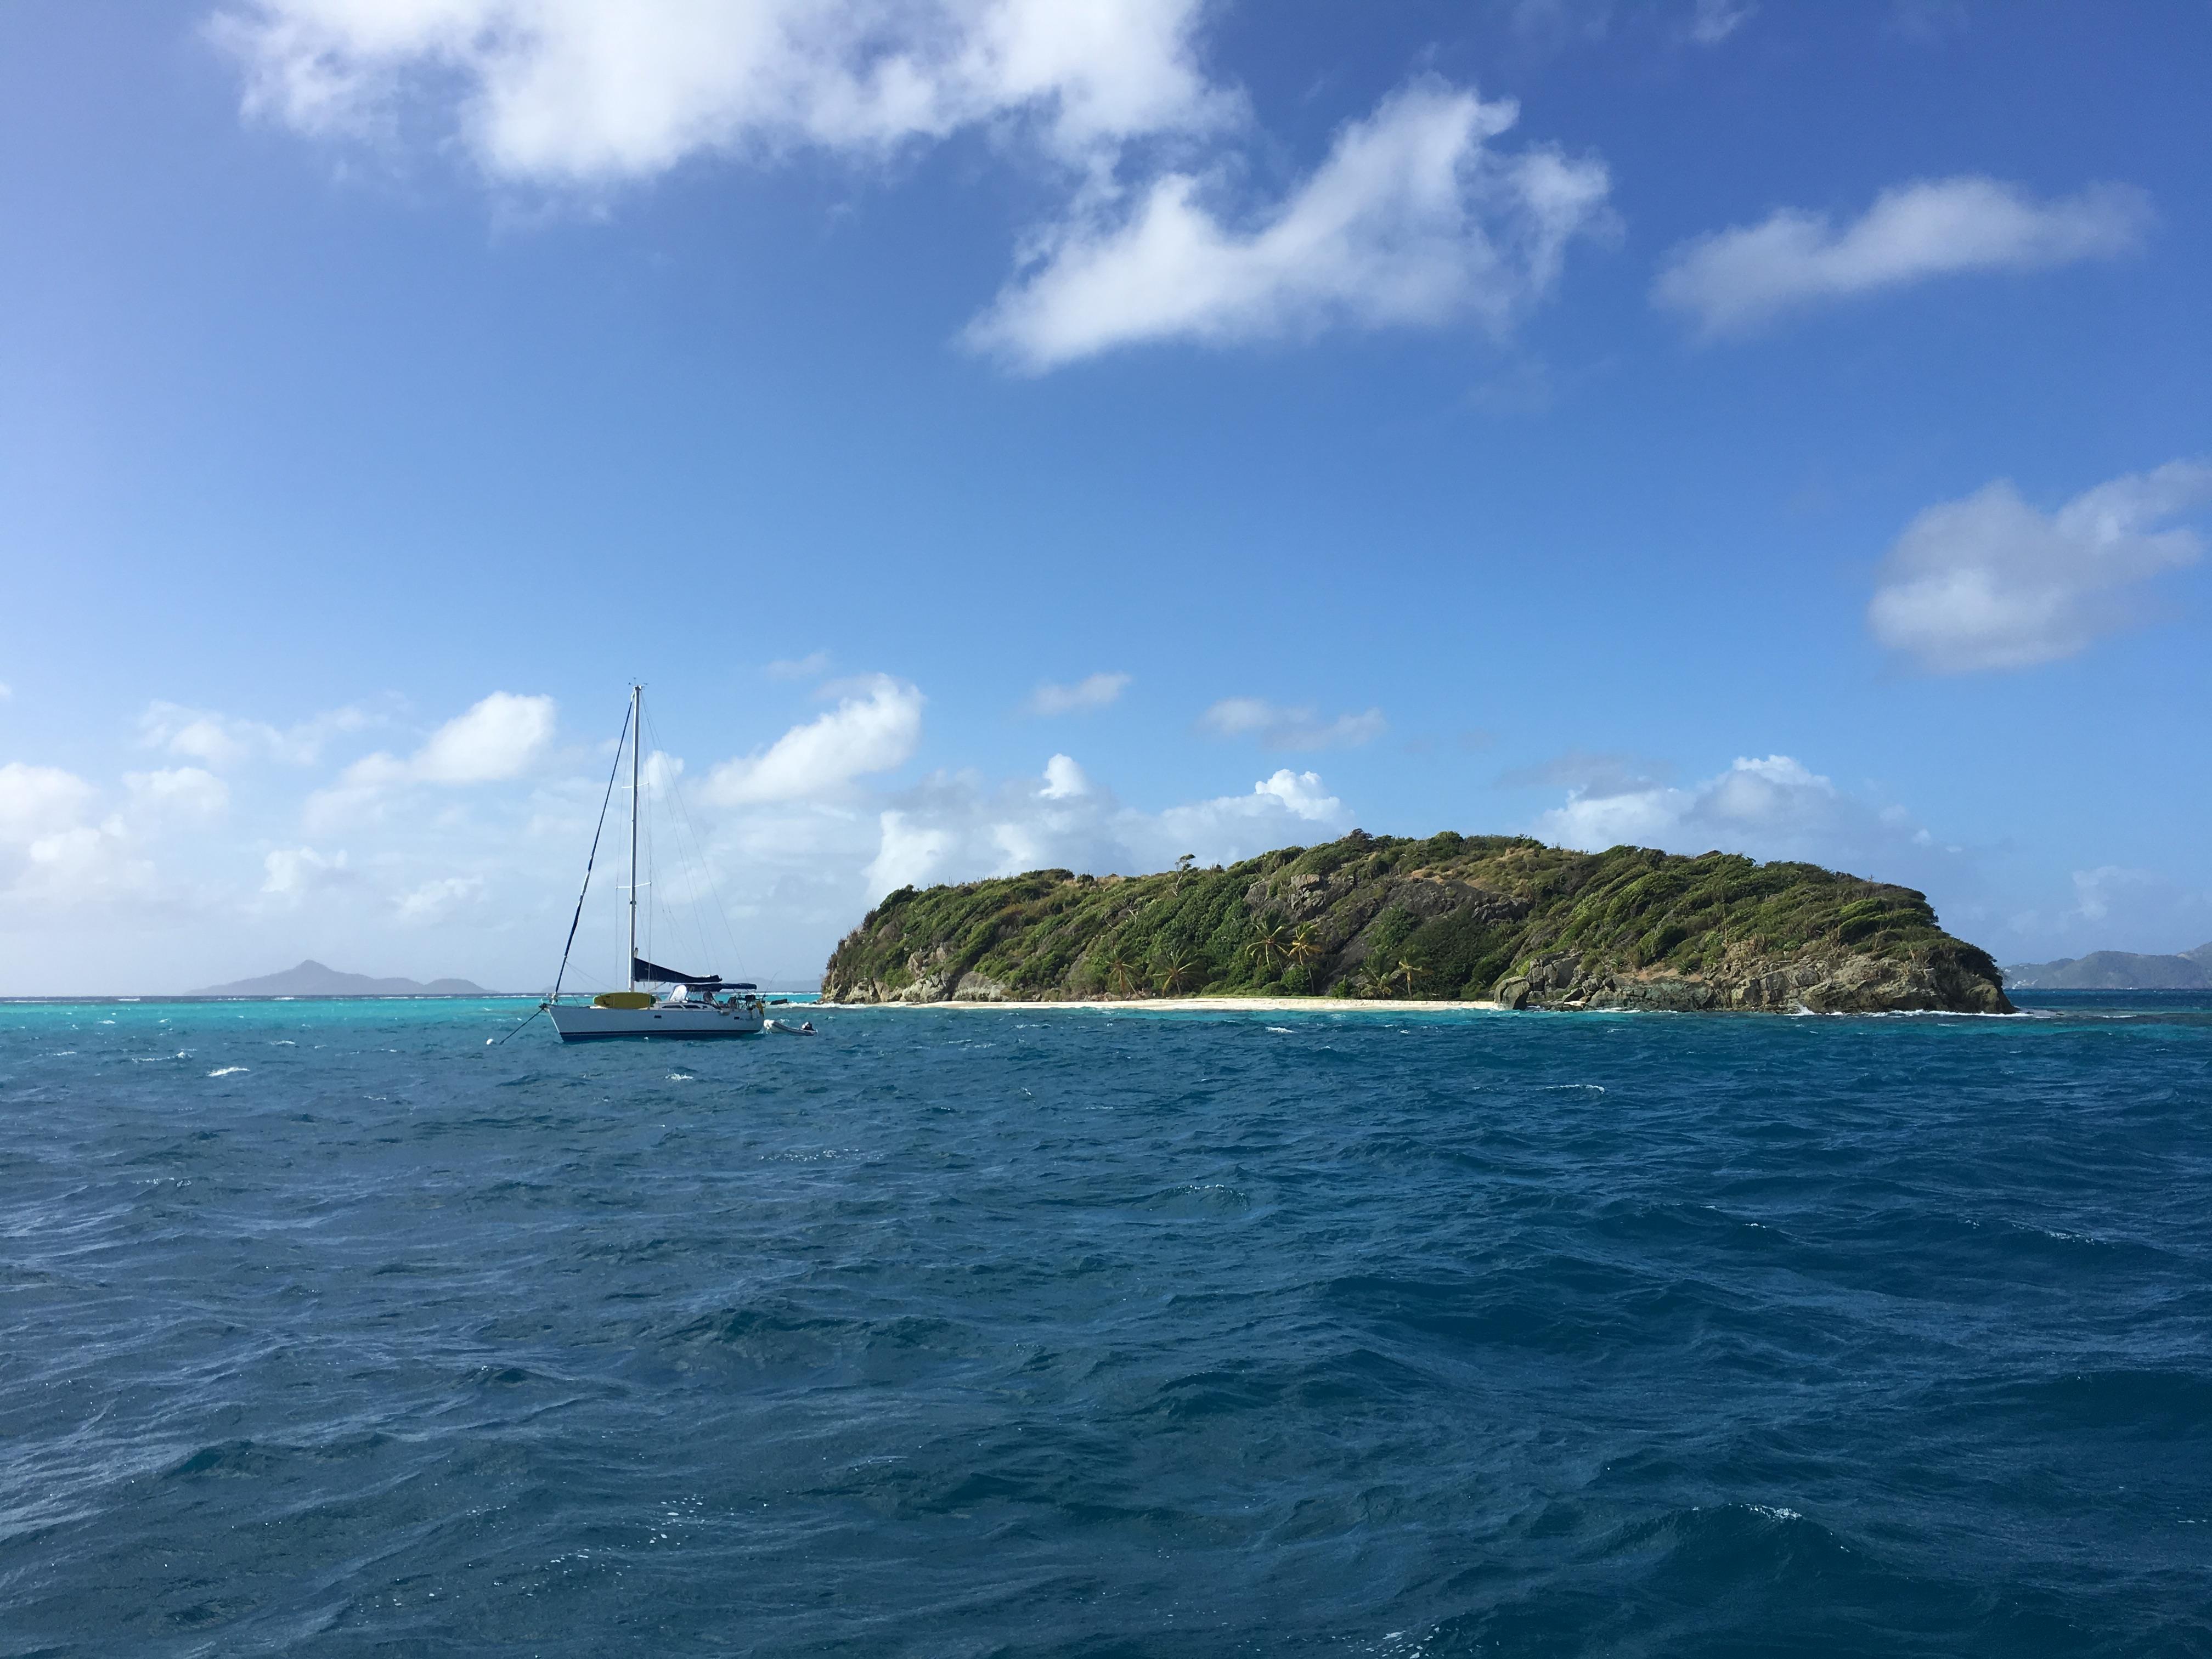 Tobago Cays - Pirates of the Caribbean.